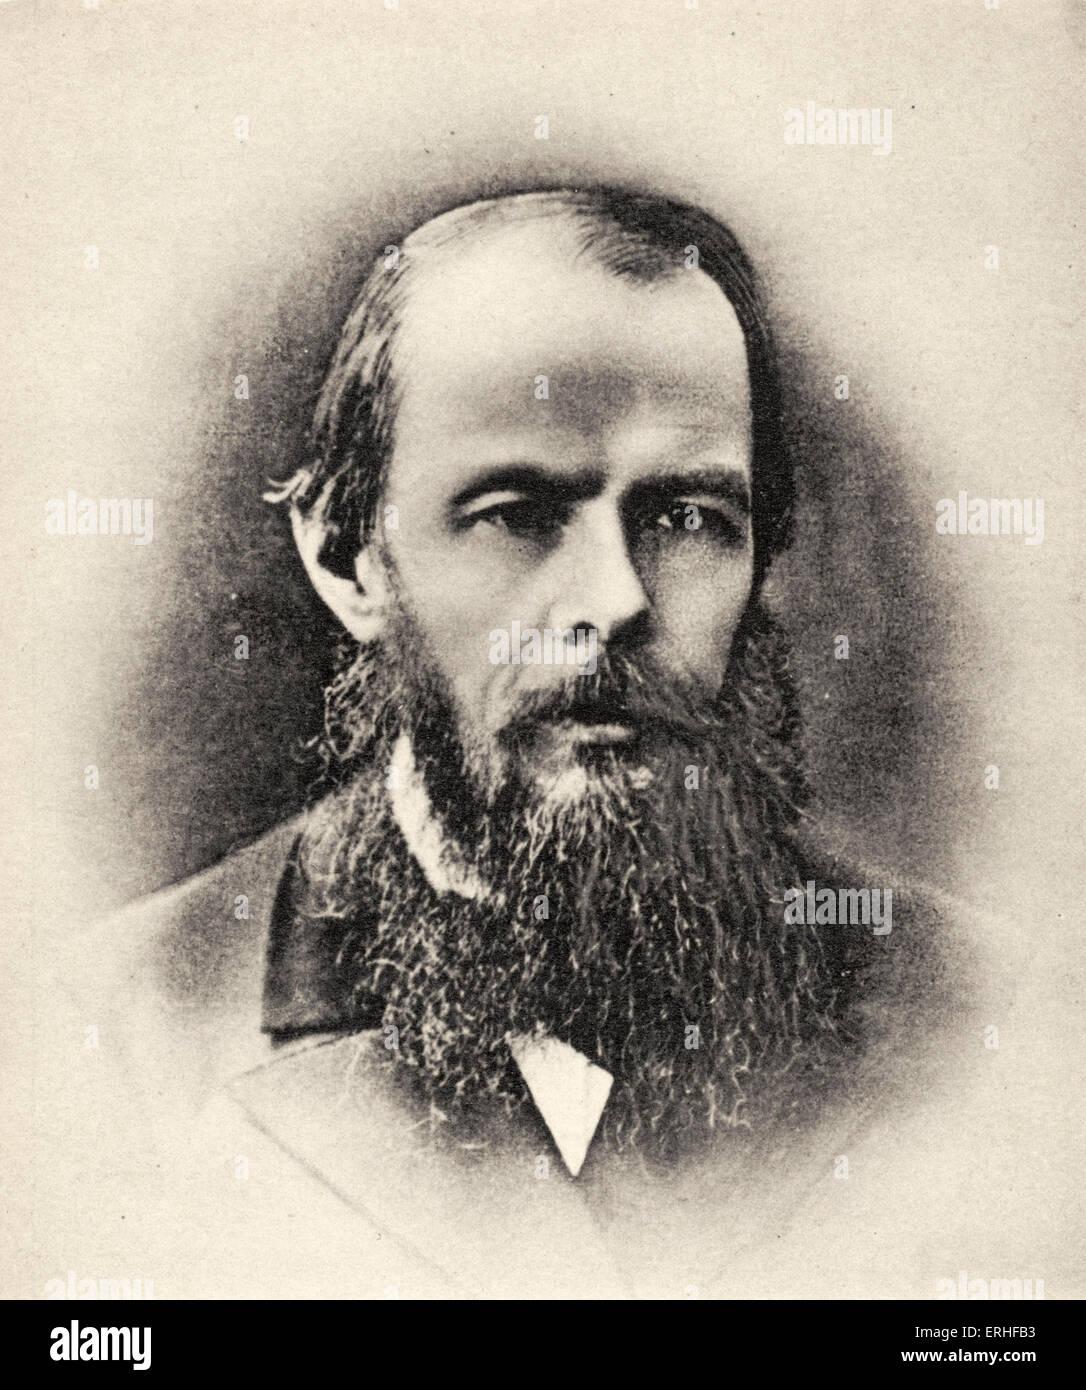 Fyodor Dostoevsky / Dostoyevsky, portrait.  Russian novelist, journalist, short-story writer. 1821 - 1881 - Stock Image